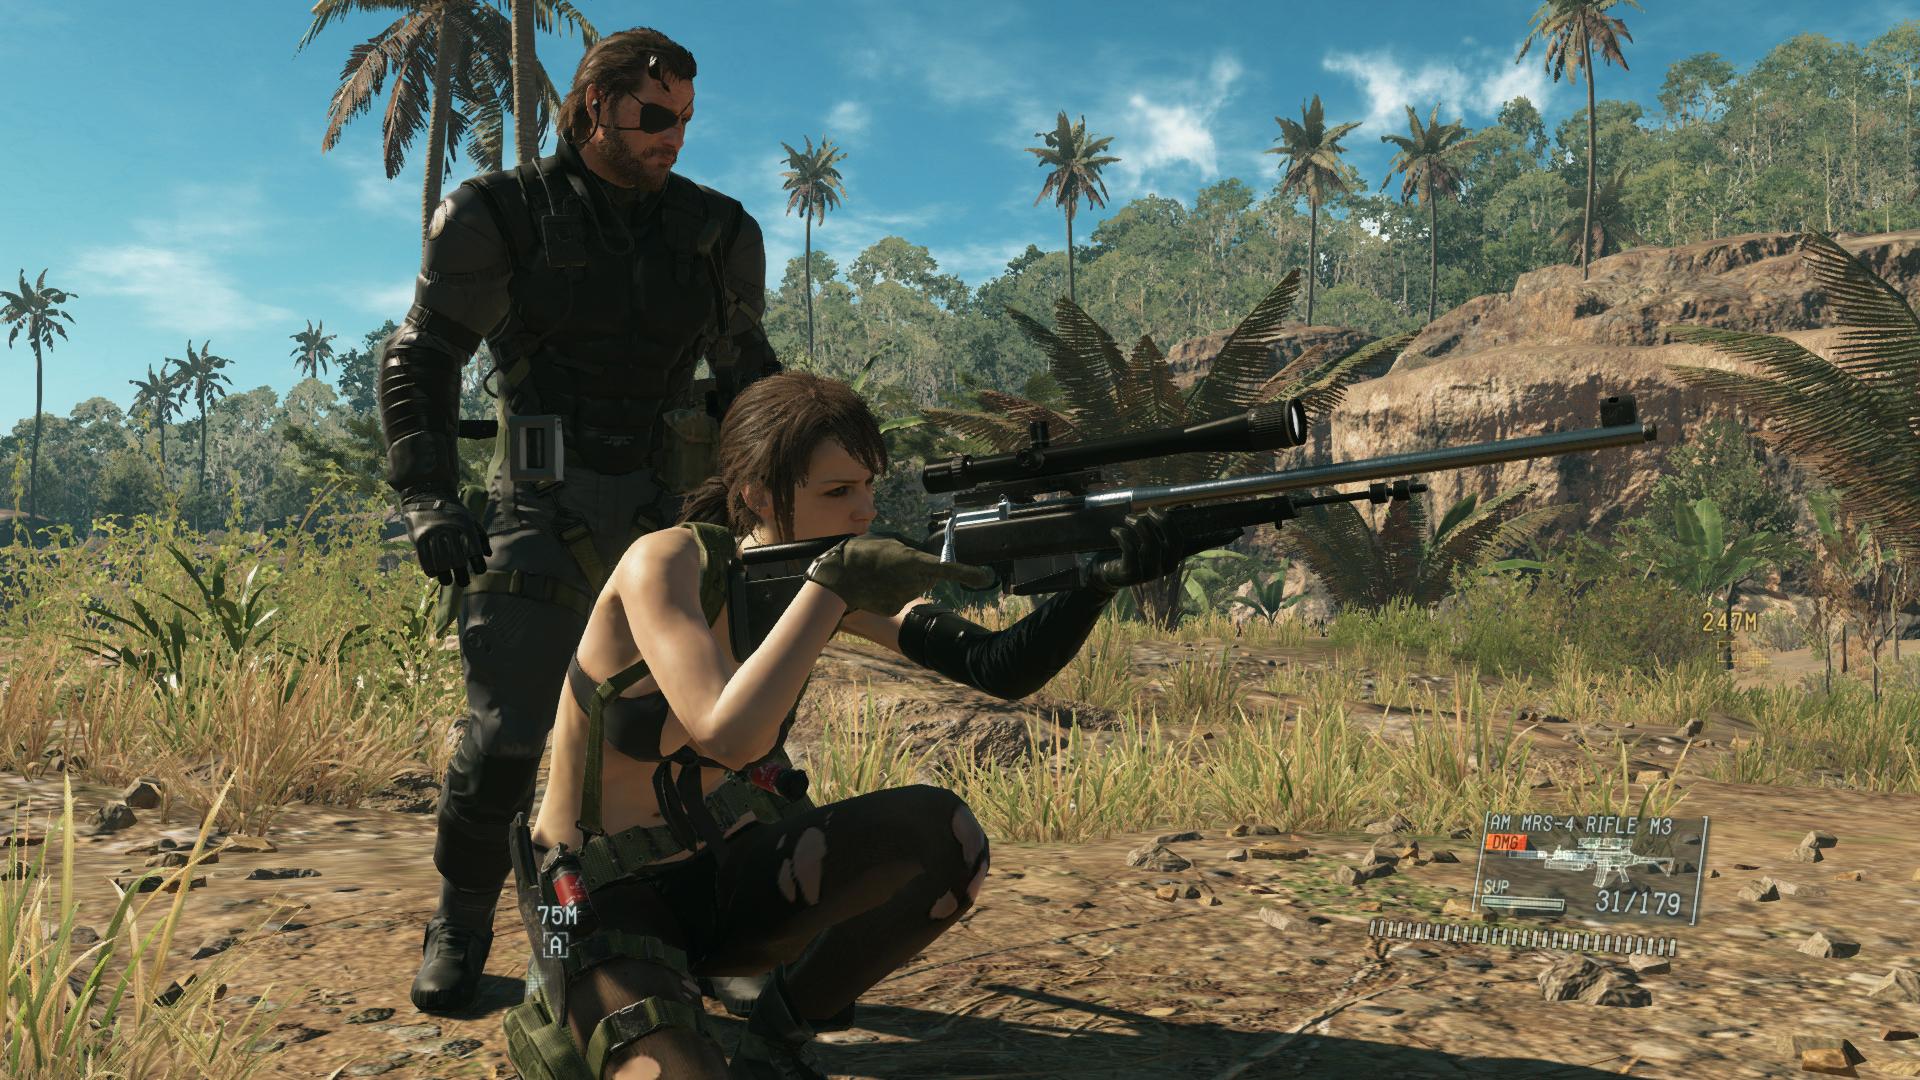 Metal Gear Solid V: The Phantom Pain image 3